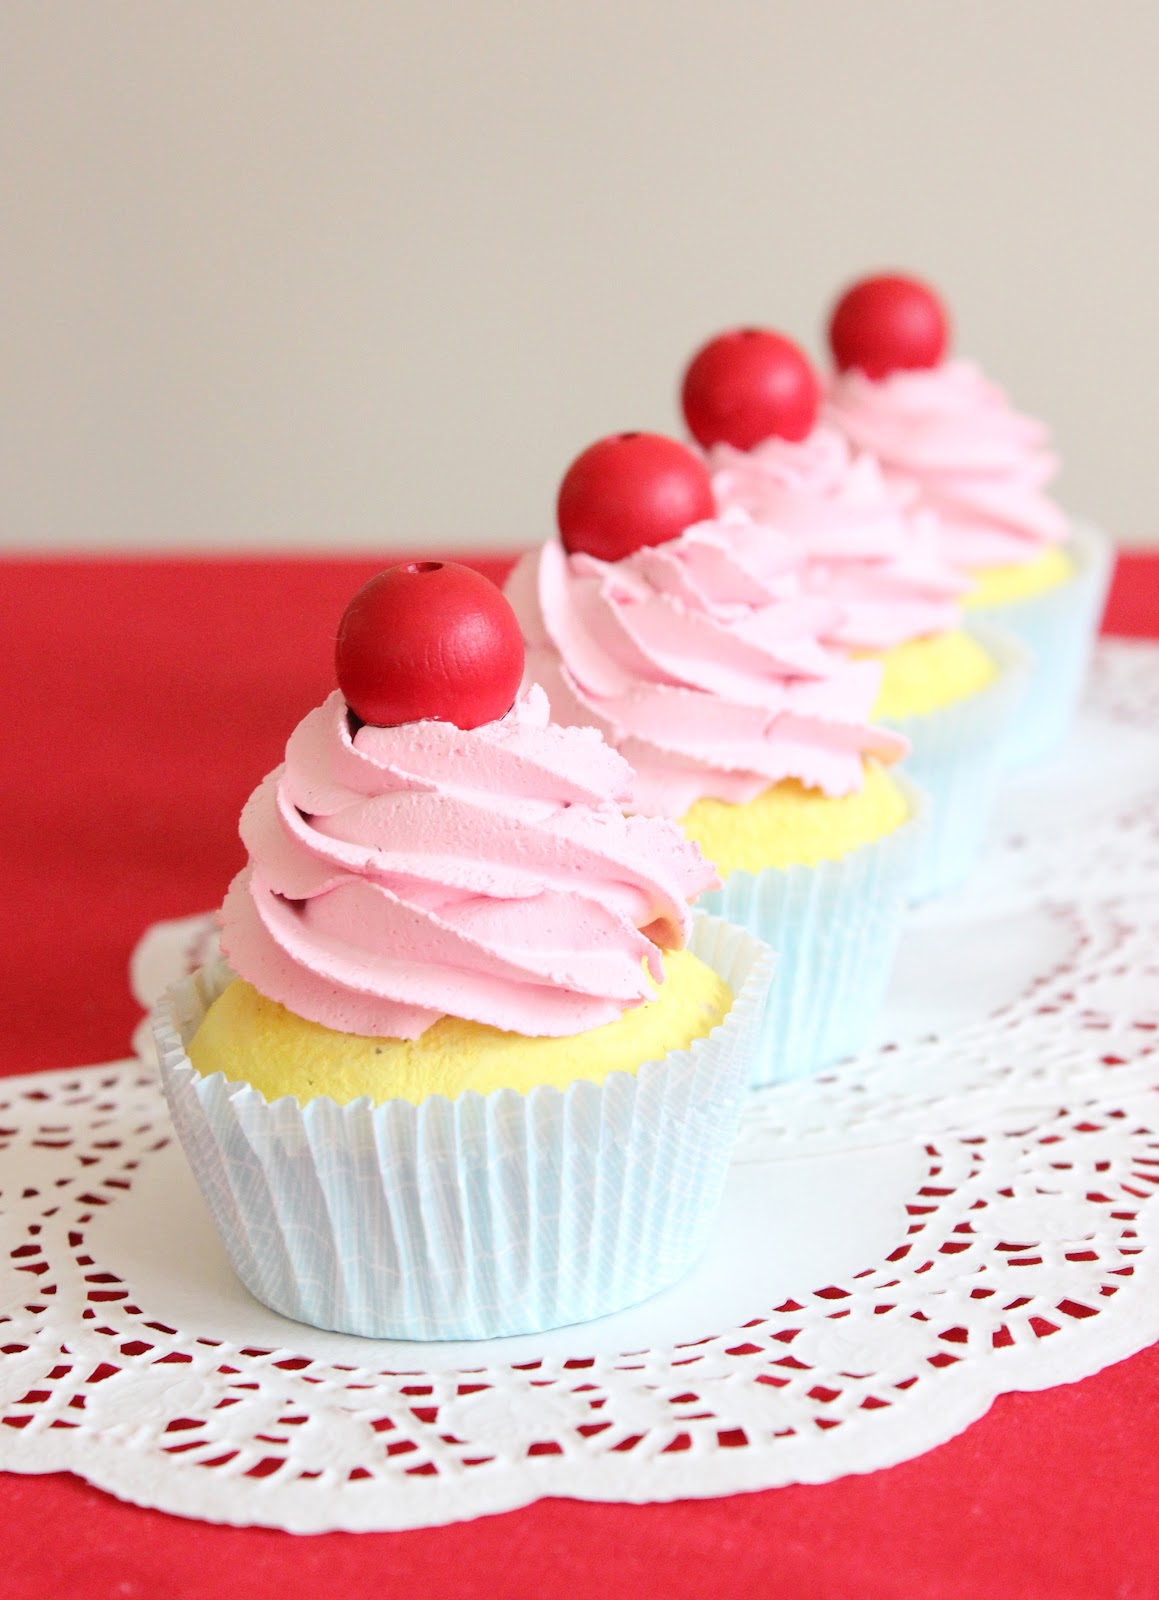 MBC: The 0 calorie cupcake